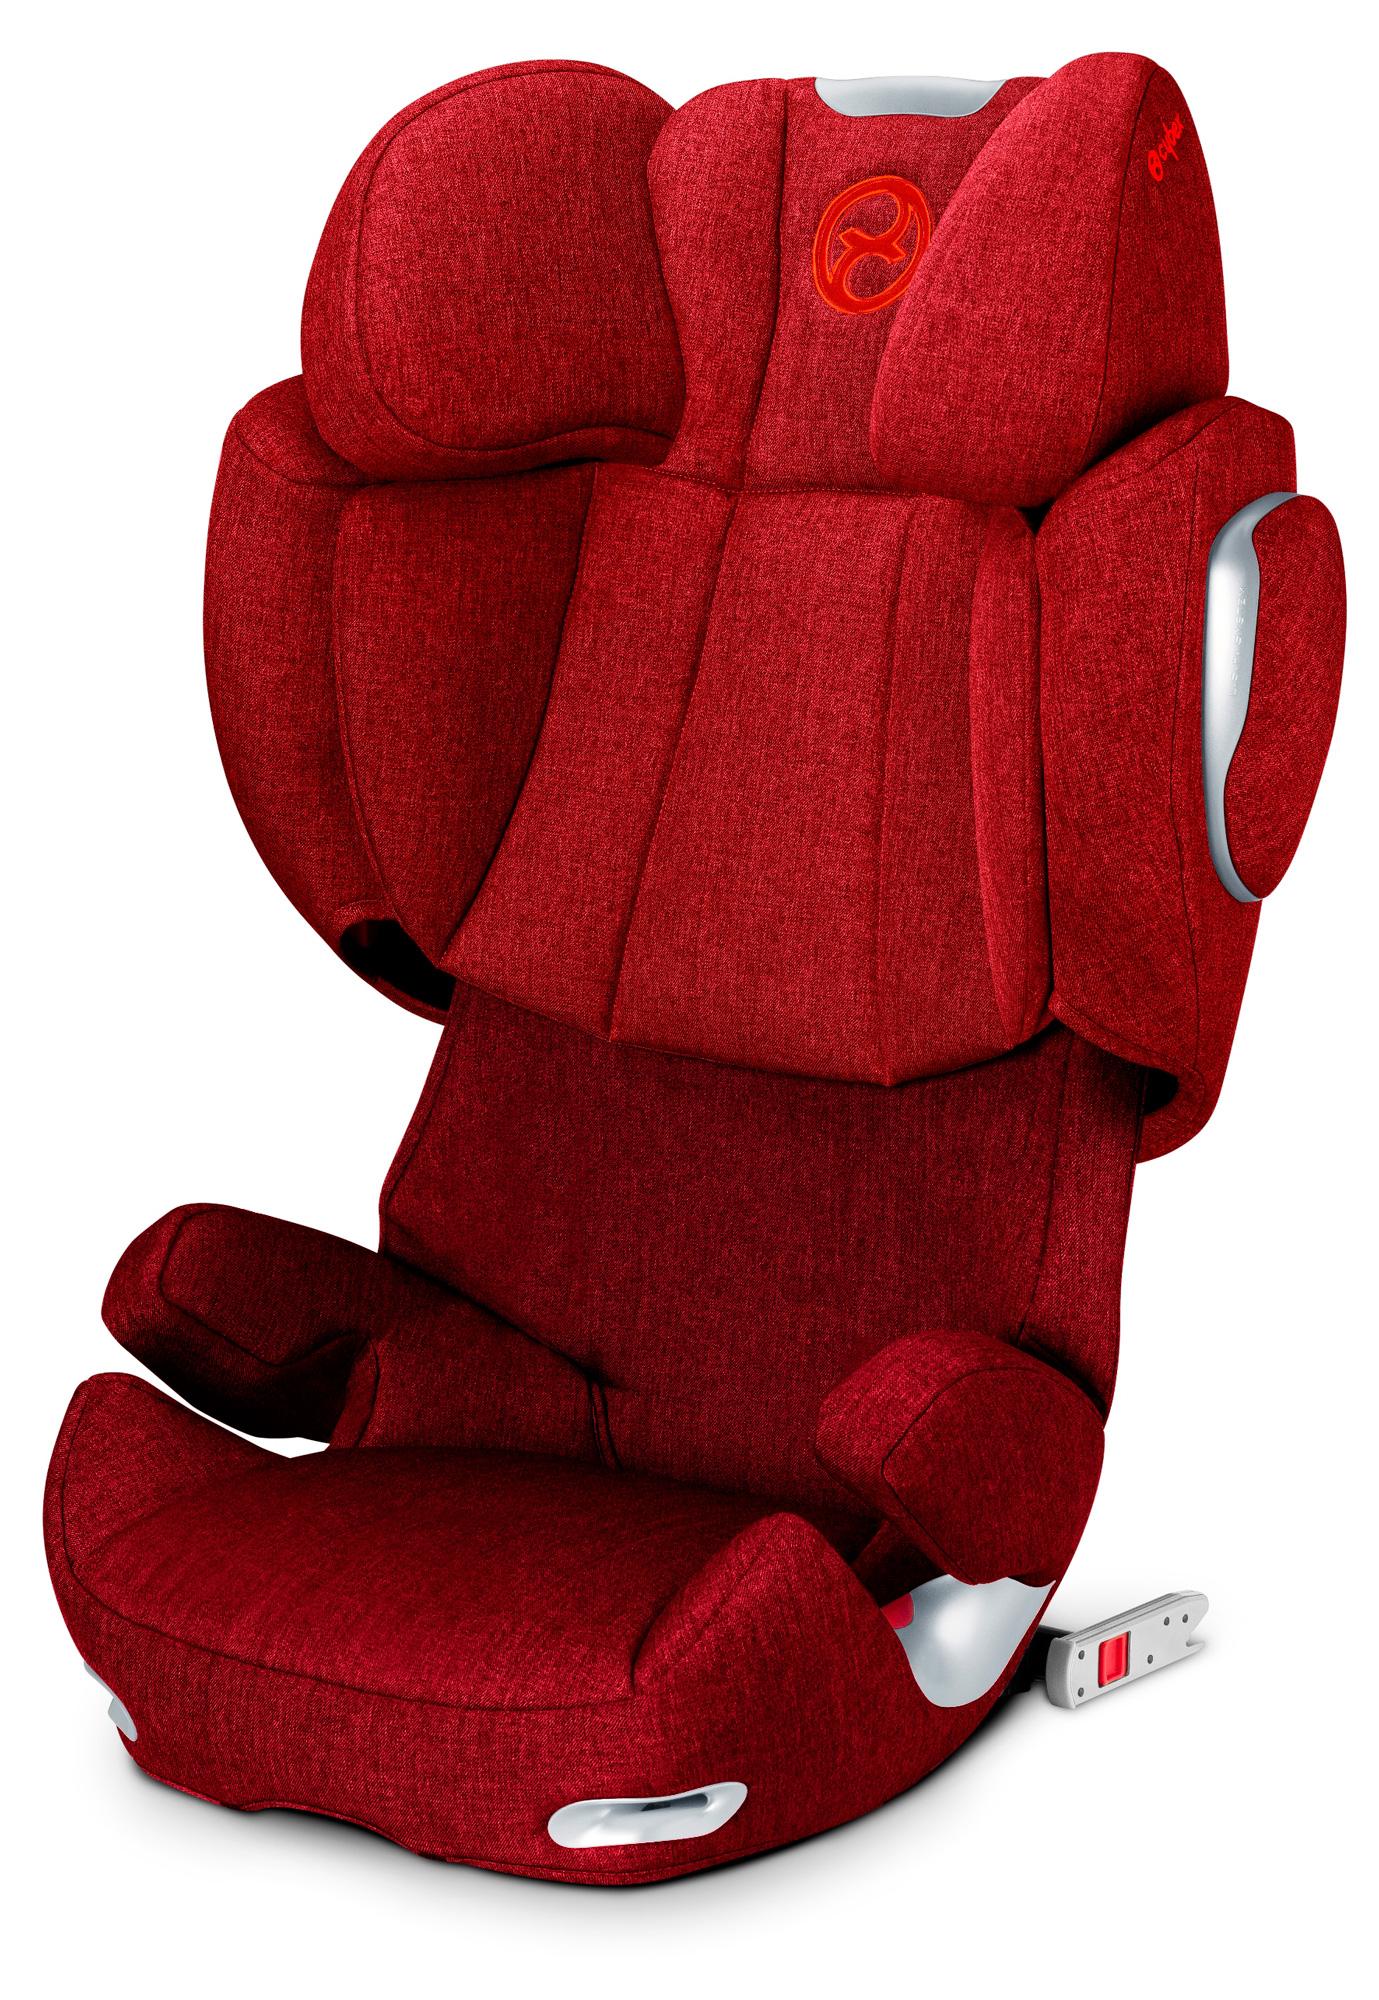 cybex solution q2 fix plus. Black Bedroom Furniture Sets. Home Design Ideas